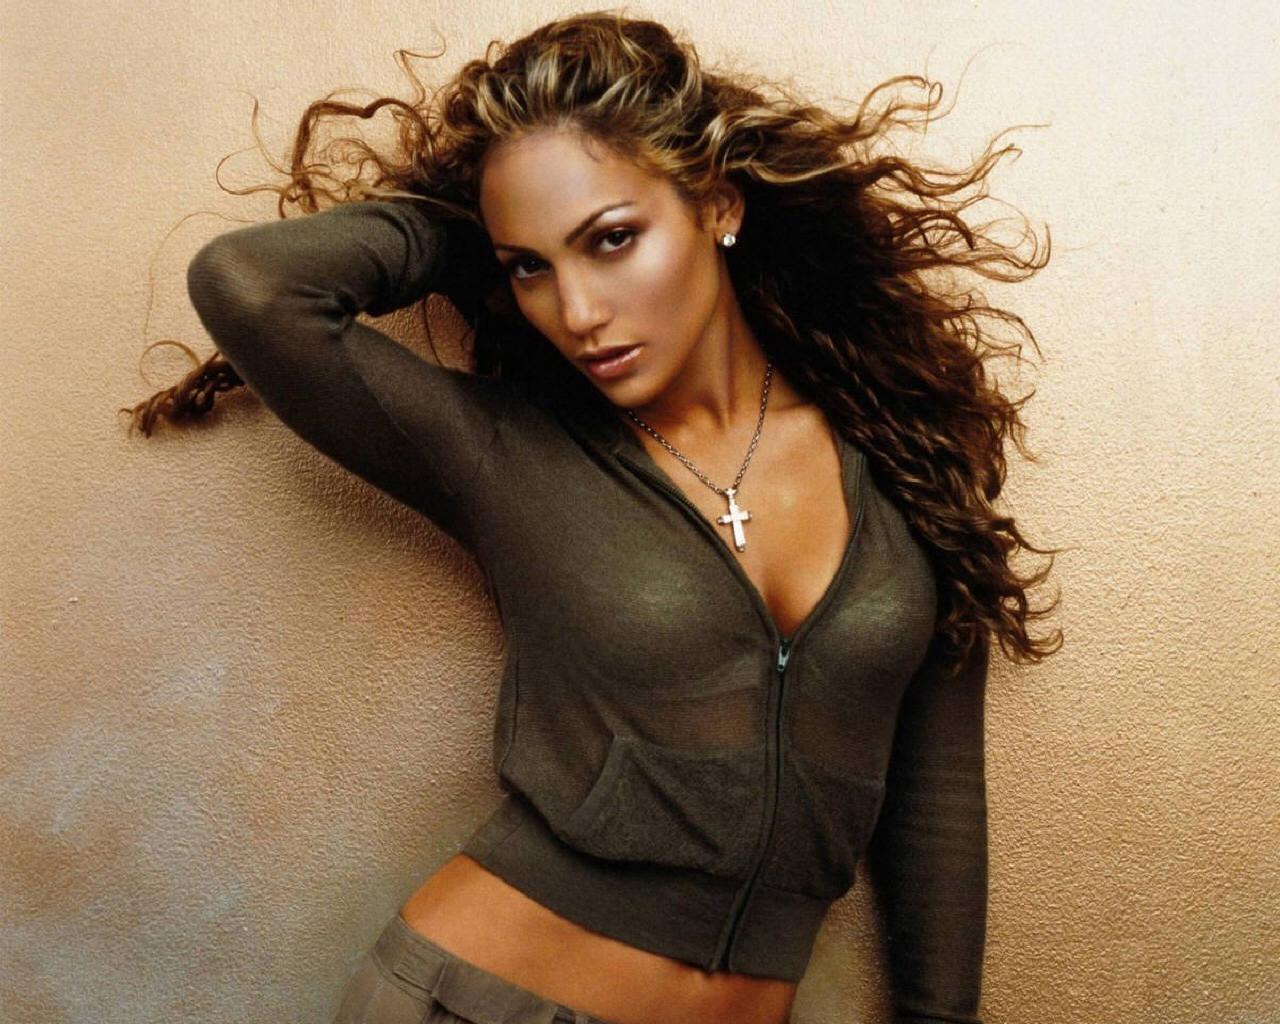 Jennifer Lopez: MagazineOh: Jennifer Lopez Glows In Maxi Skirt, White Top